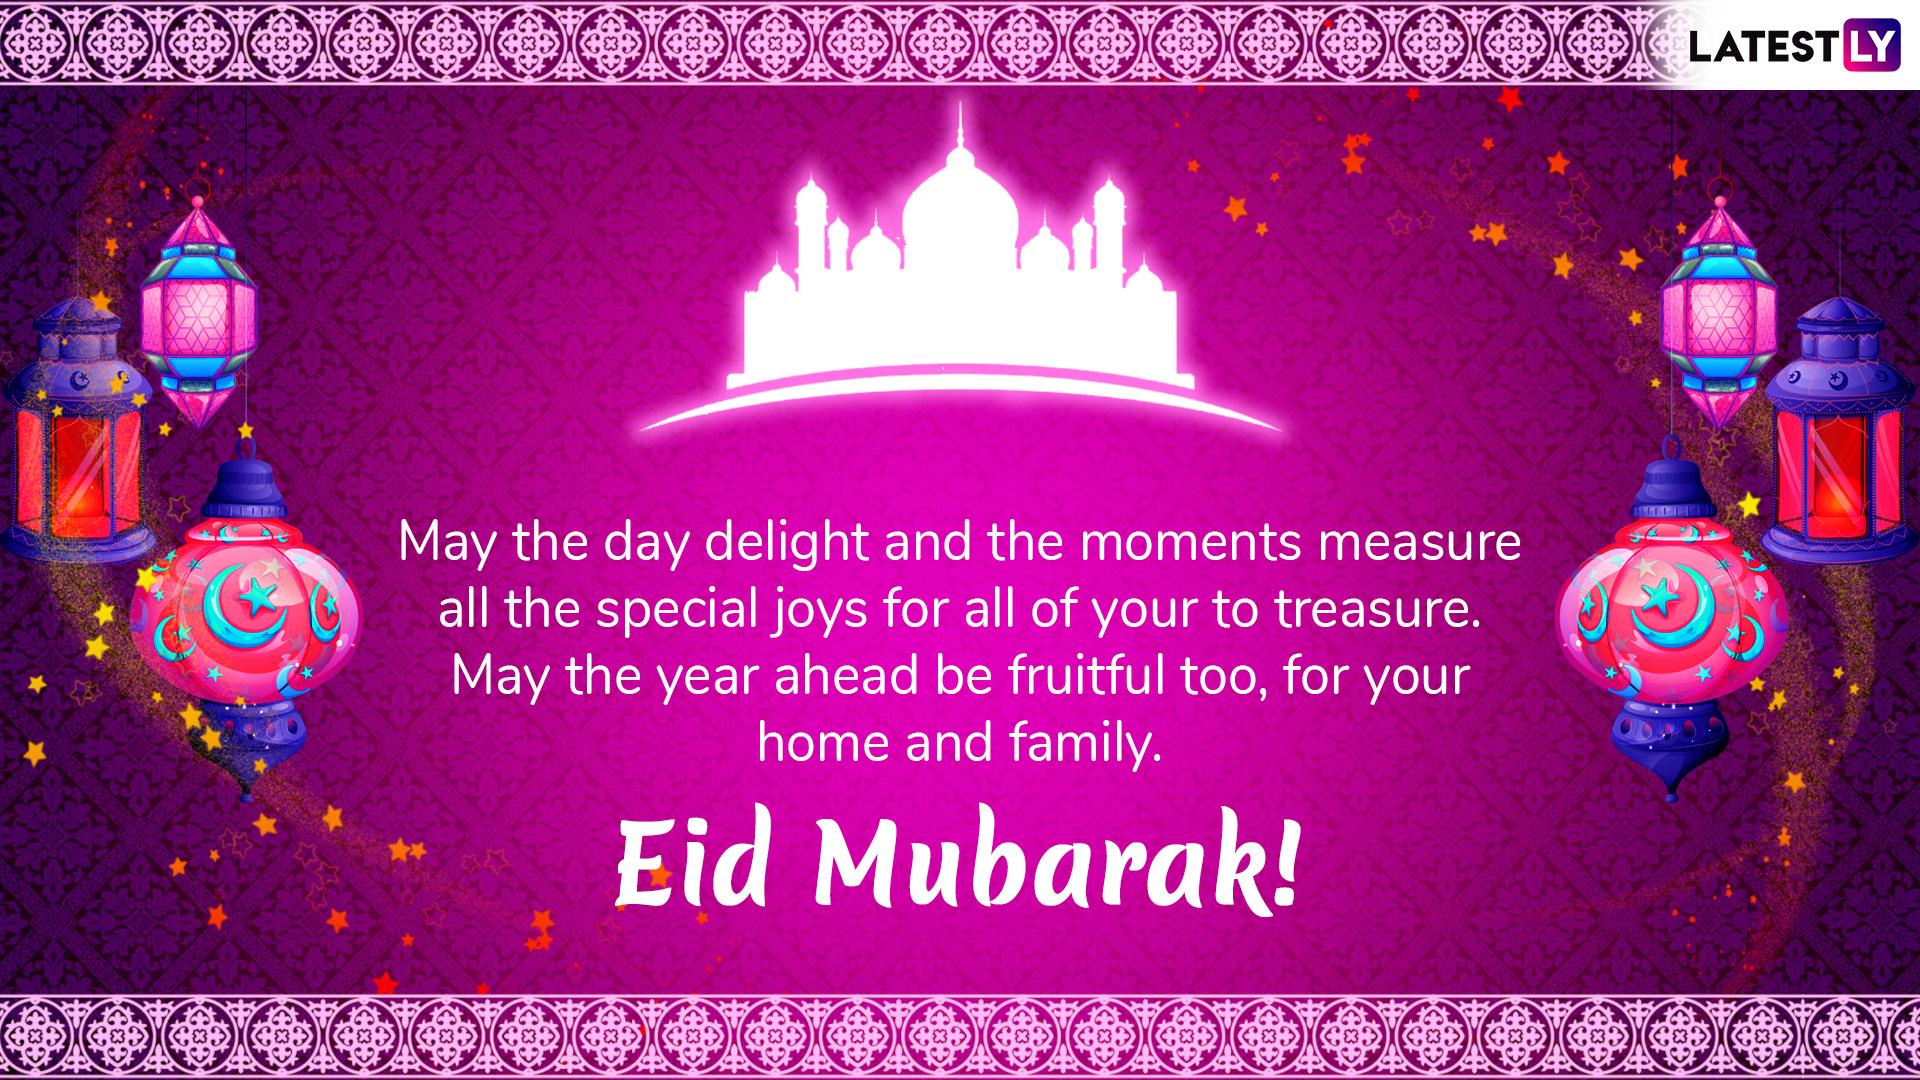 eid mubarak 2019 greetings whatsapp stickers eid alfitr